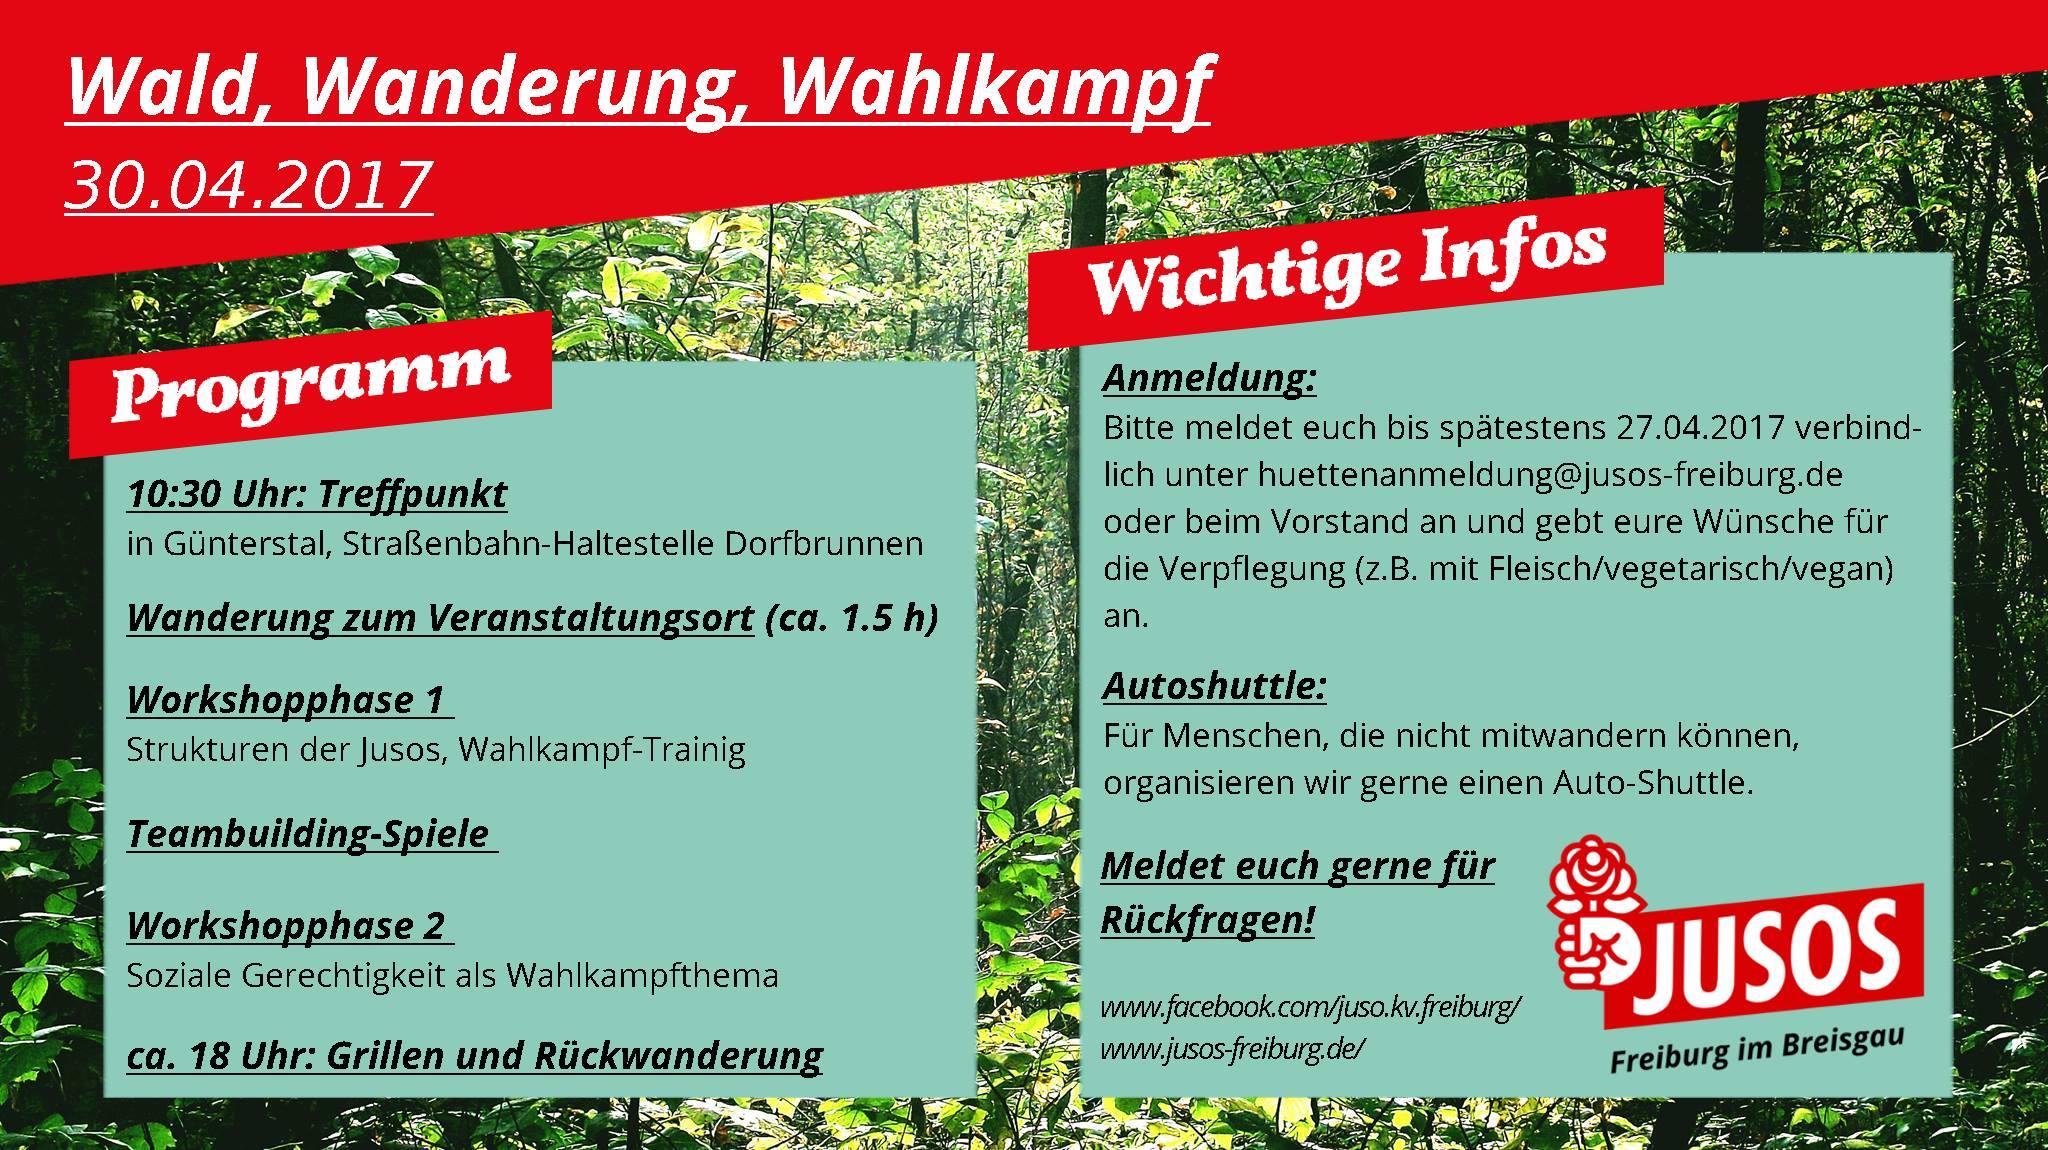 Wanderung, Wald, Wahlkampf – Fit für den Wahlkampf